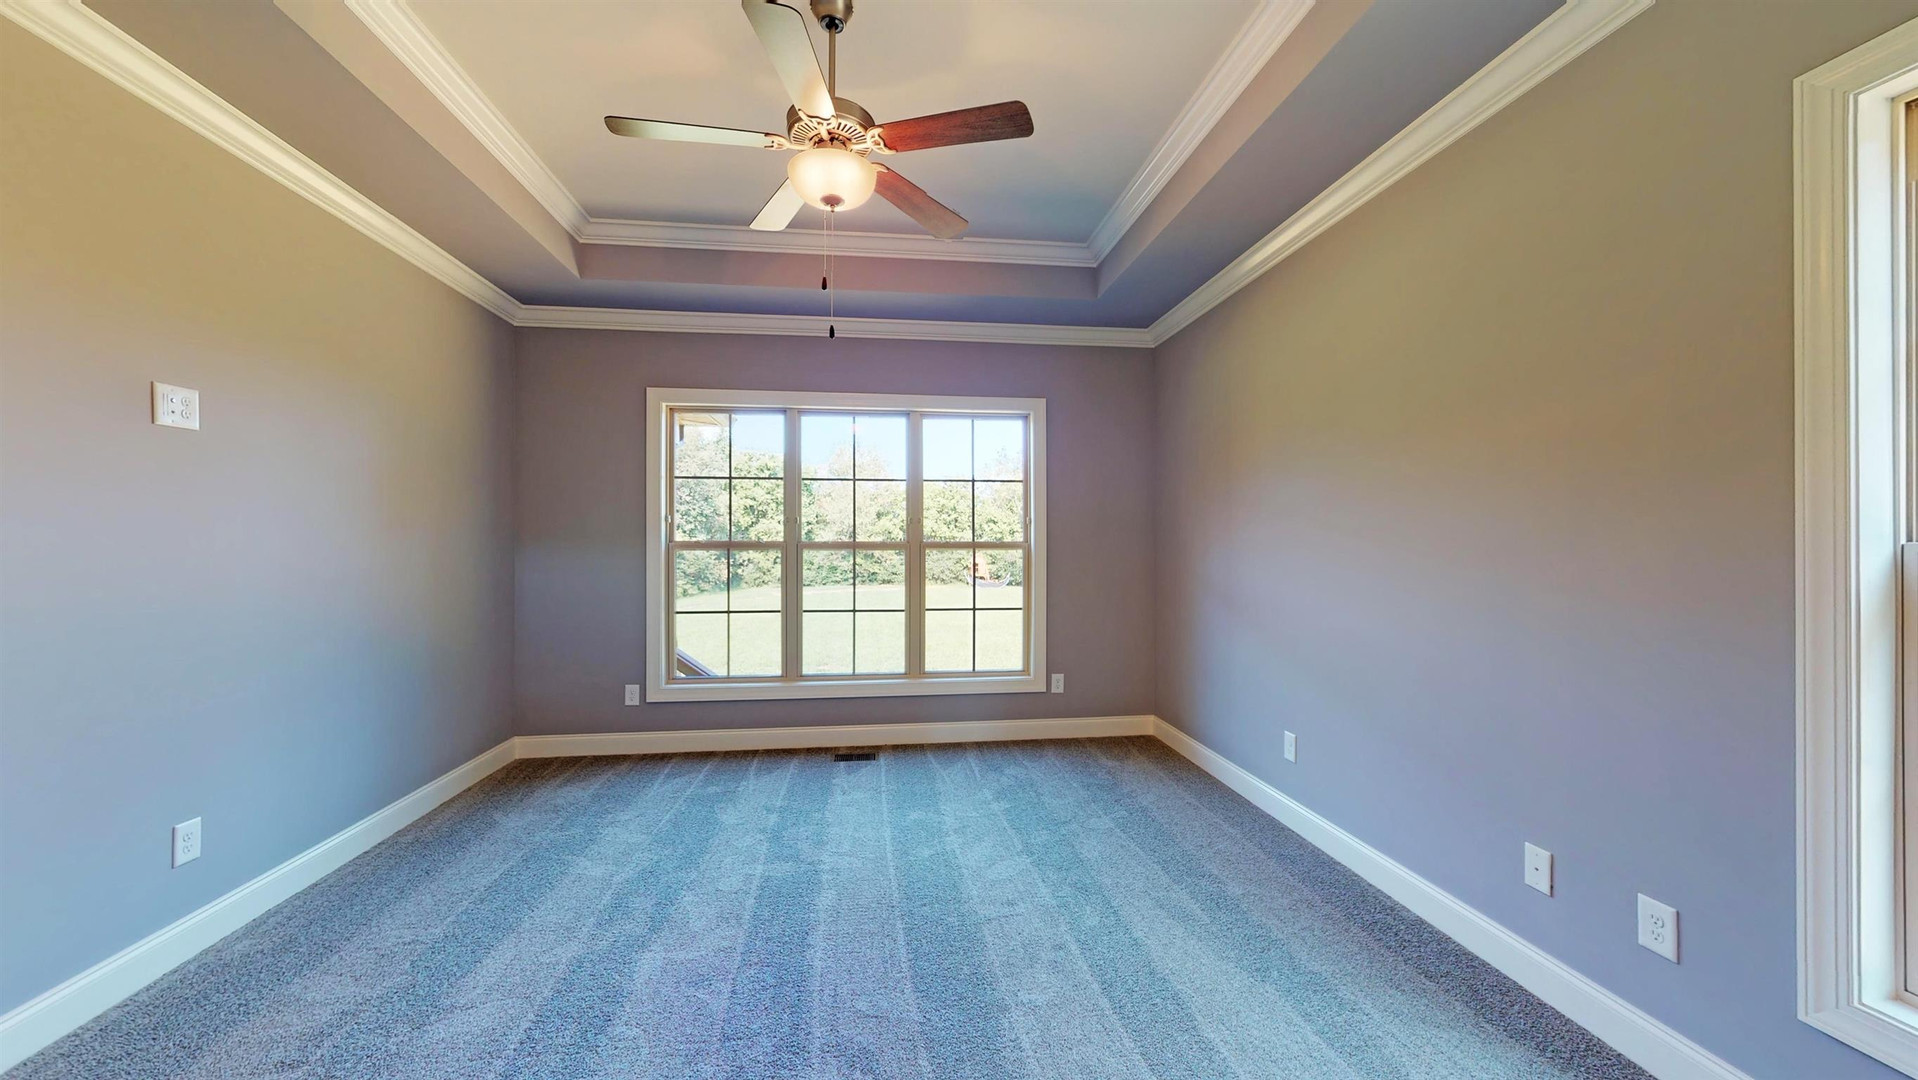 Summergrove Master Bedroom